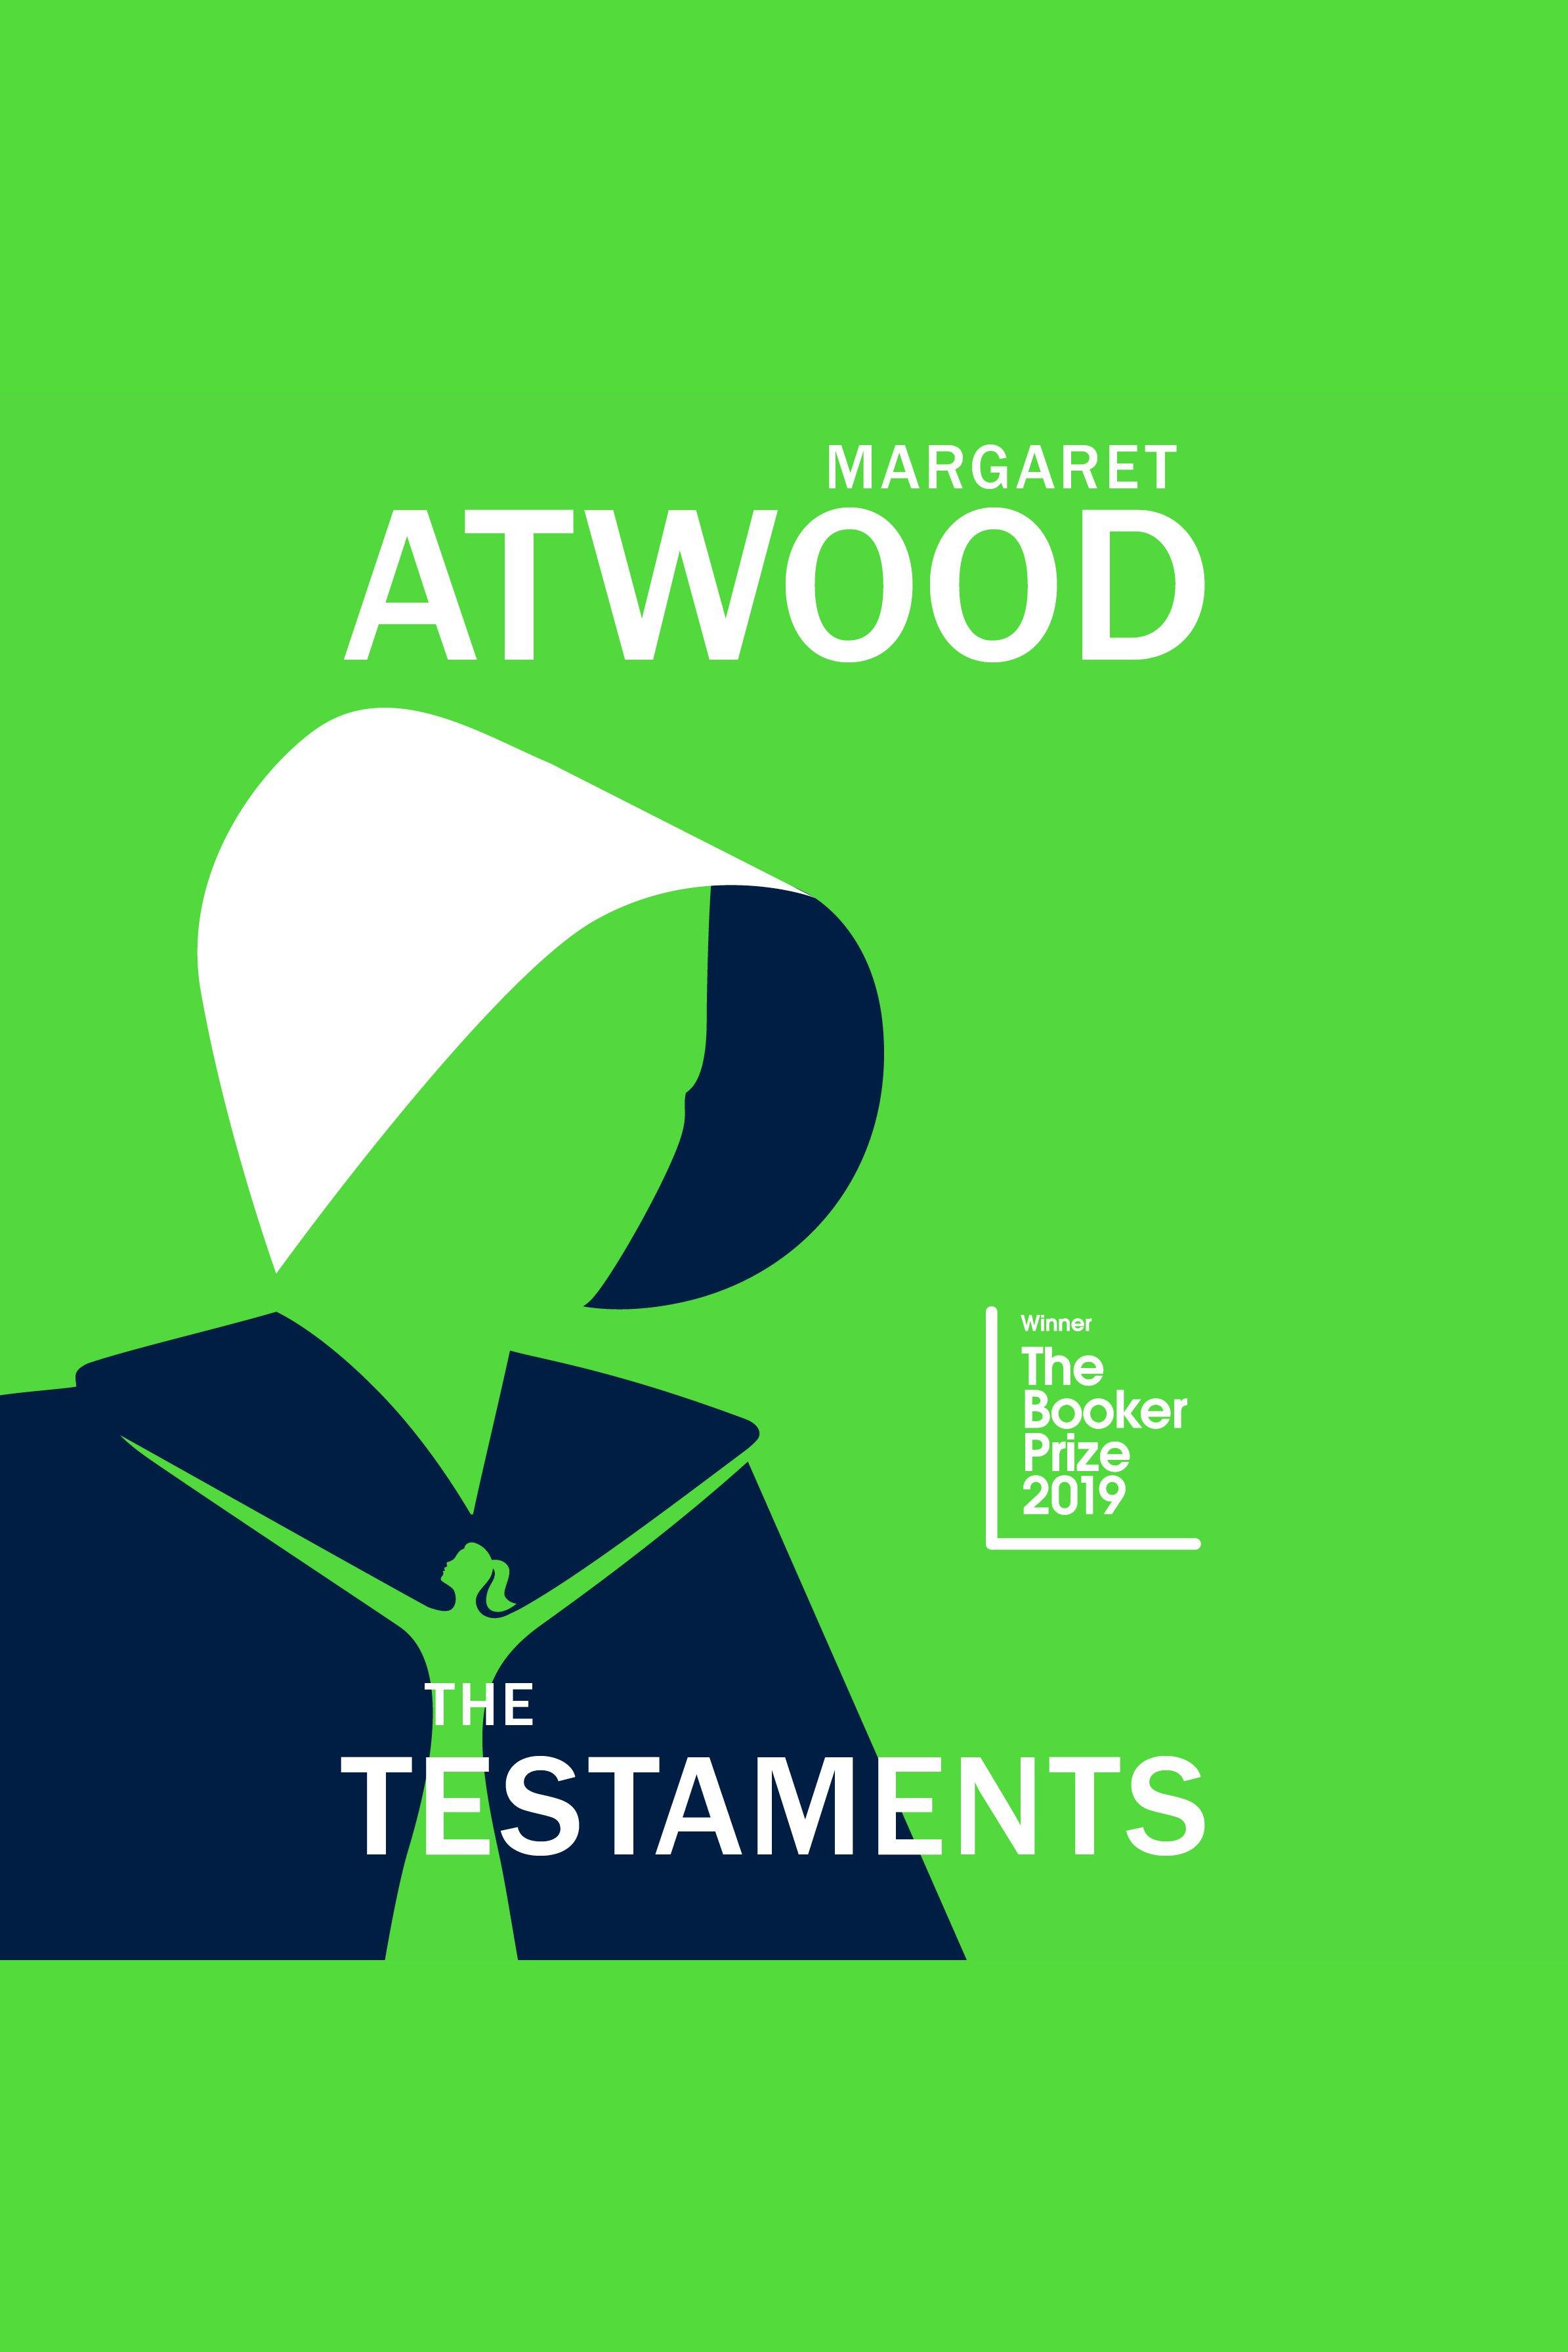 Testaments, The A Novel